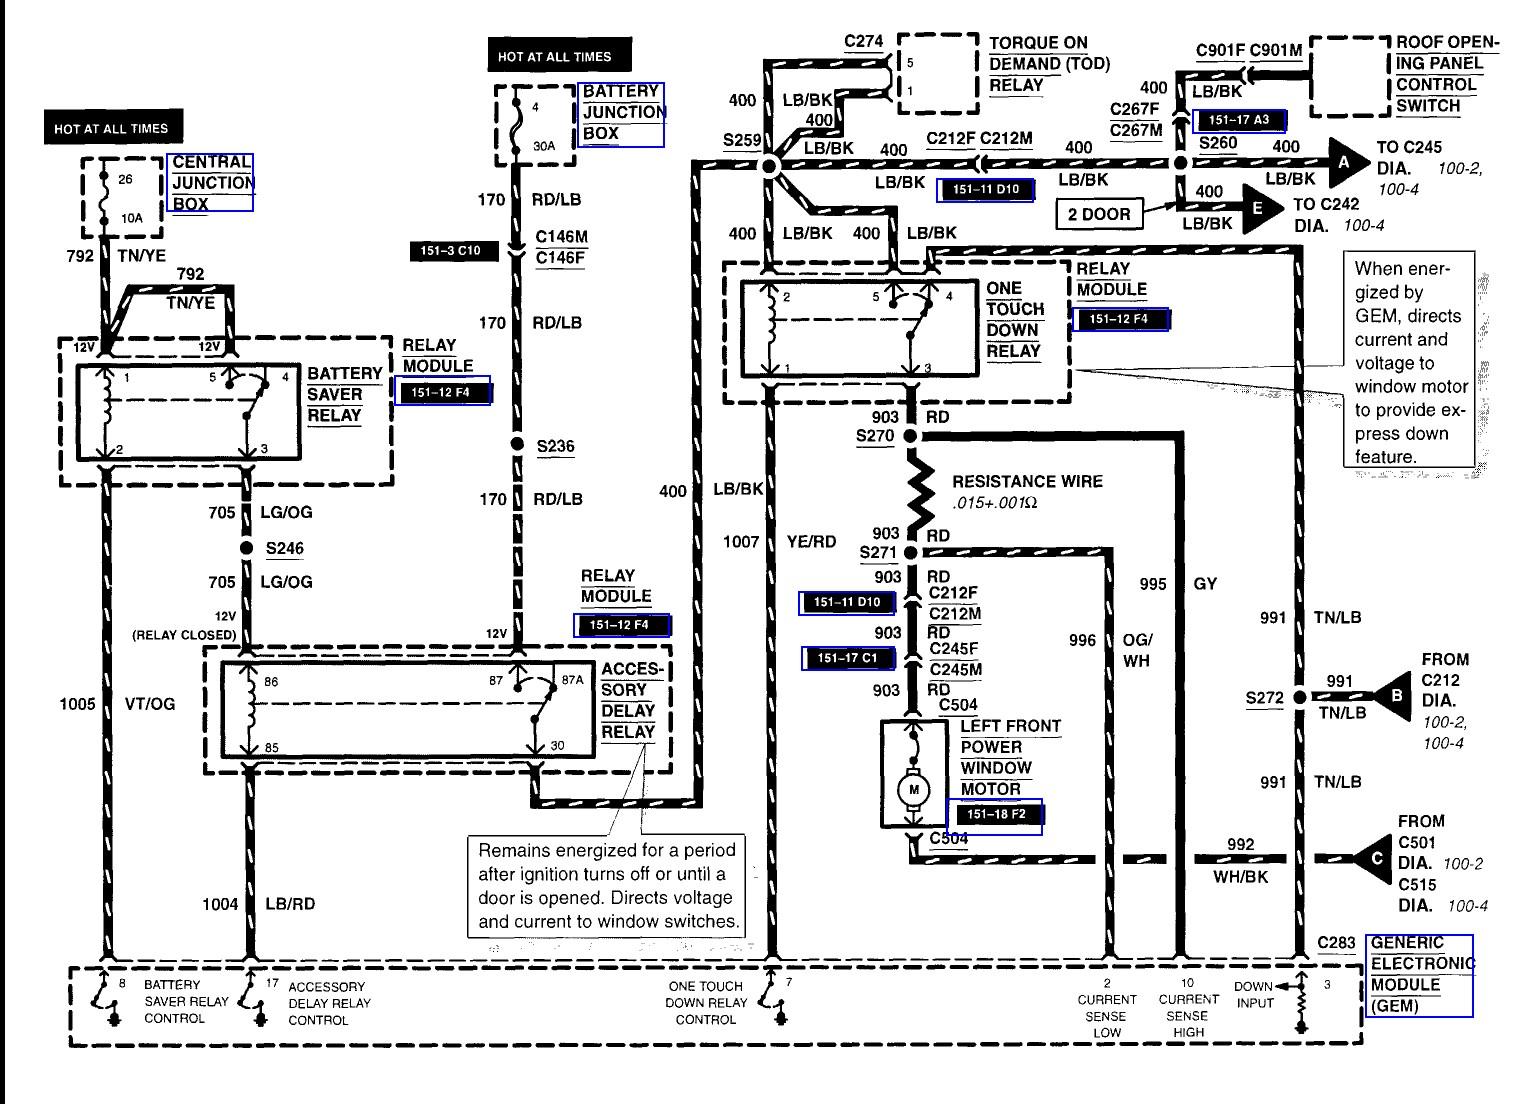 ford excursion fuse diagram wiring diagram 2005 Excursion Running Boards Wiring ford excursion wiring diagram window online wiring diagramwiring diagram for 2000 ford excursion 2007 ford f53